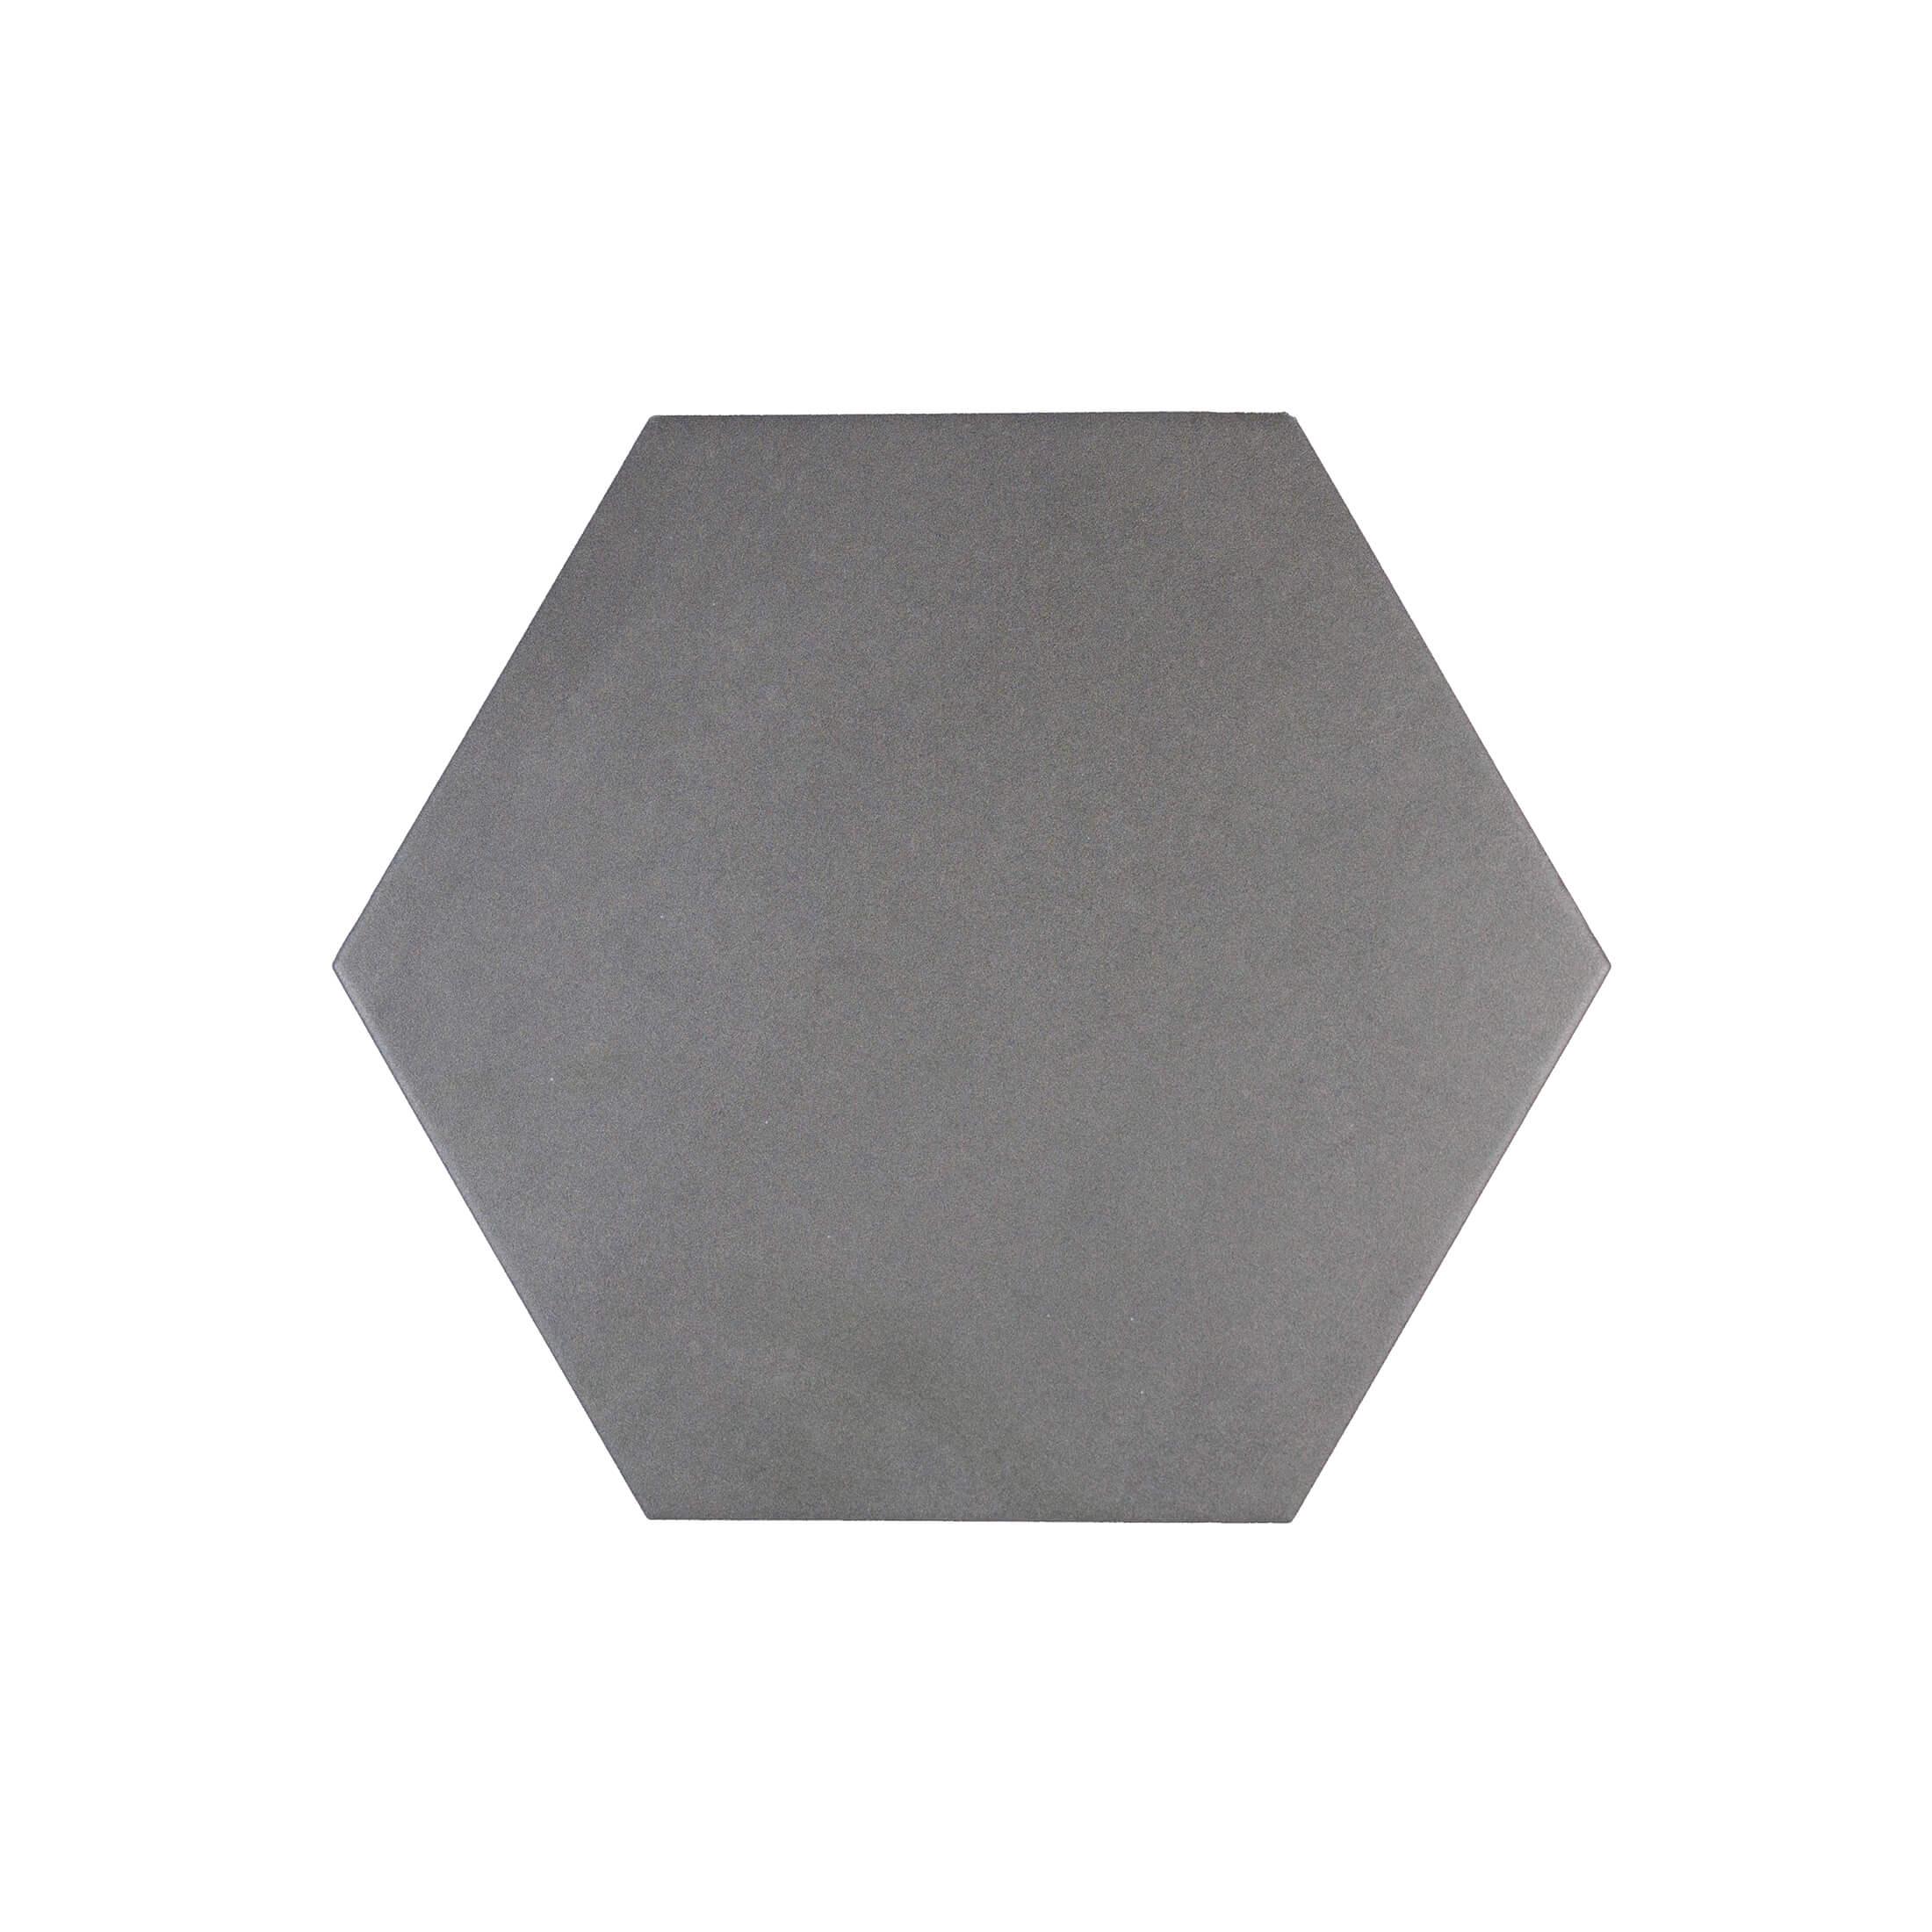 ADPV9013 - PAVIMENTO DARK GRAY - 20 cm X 2,3 cm